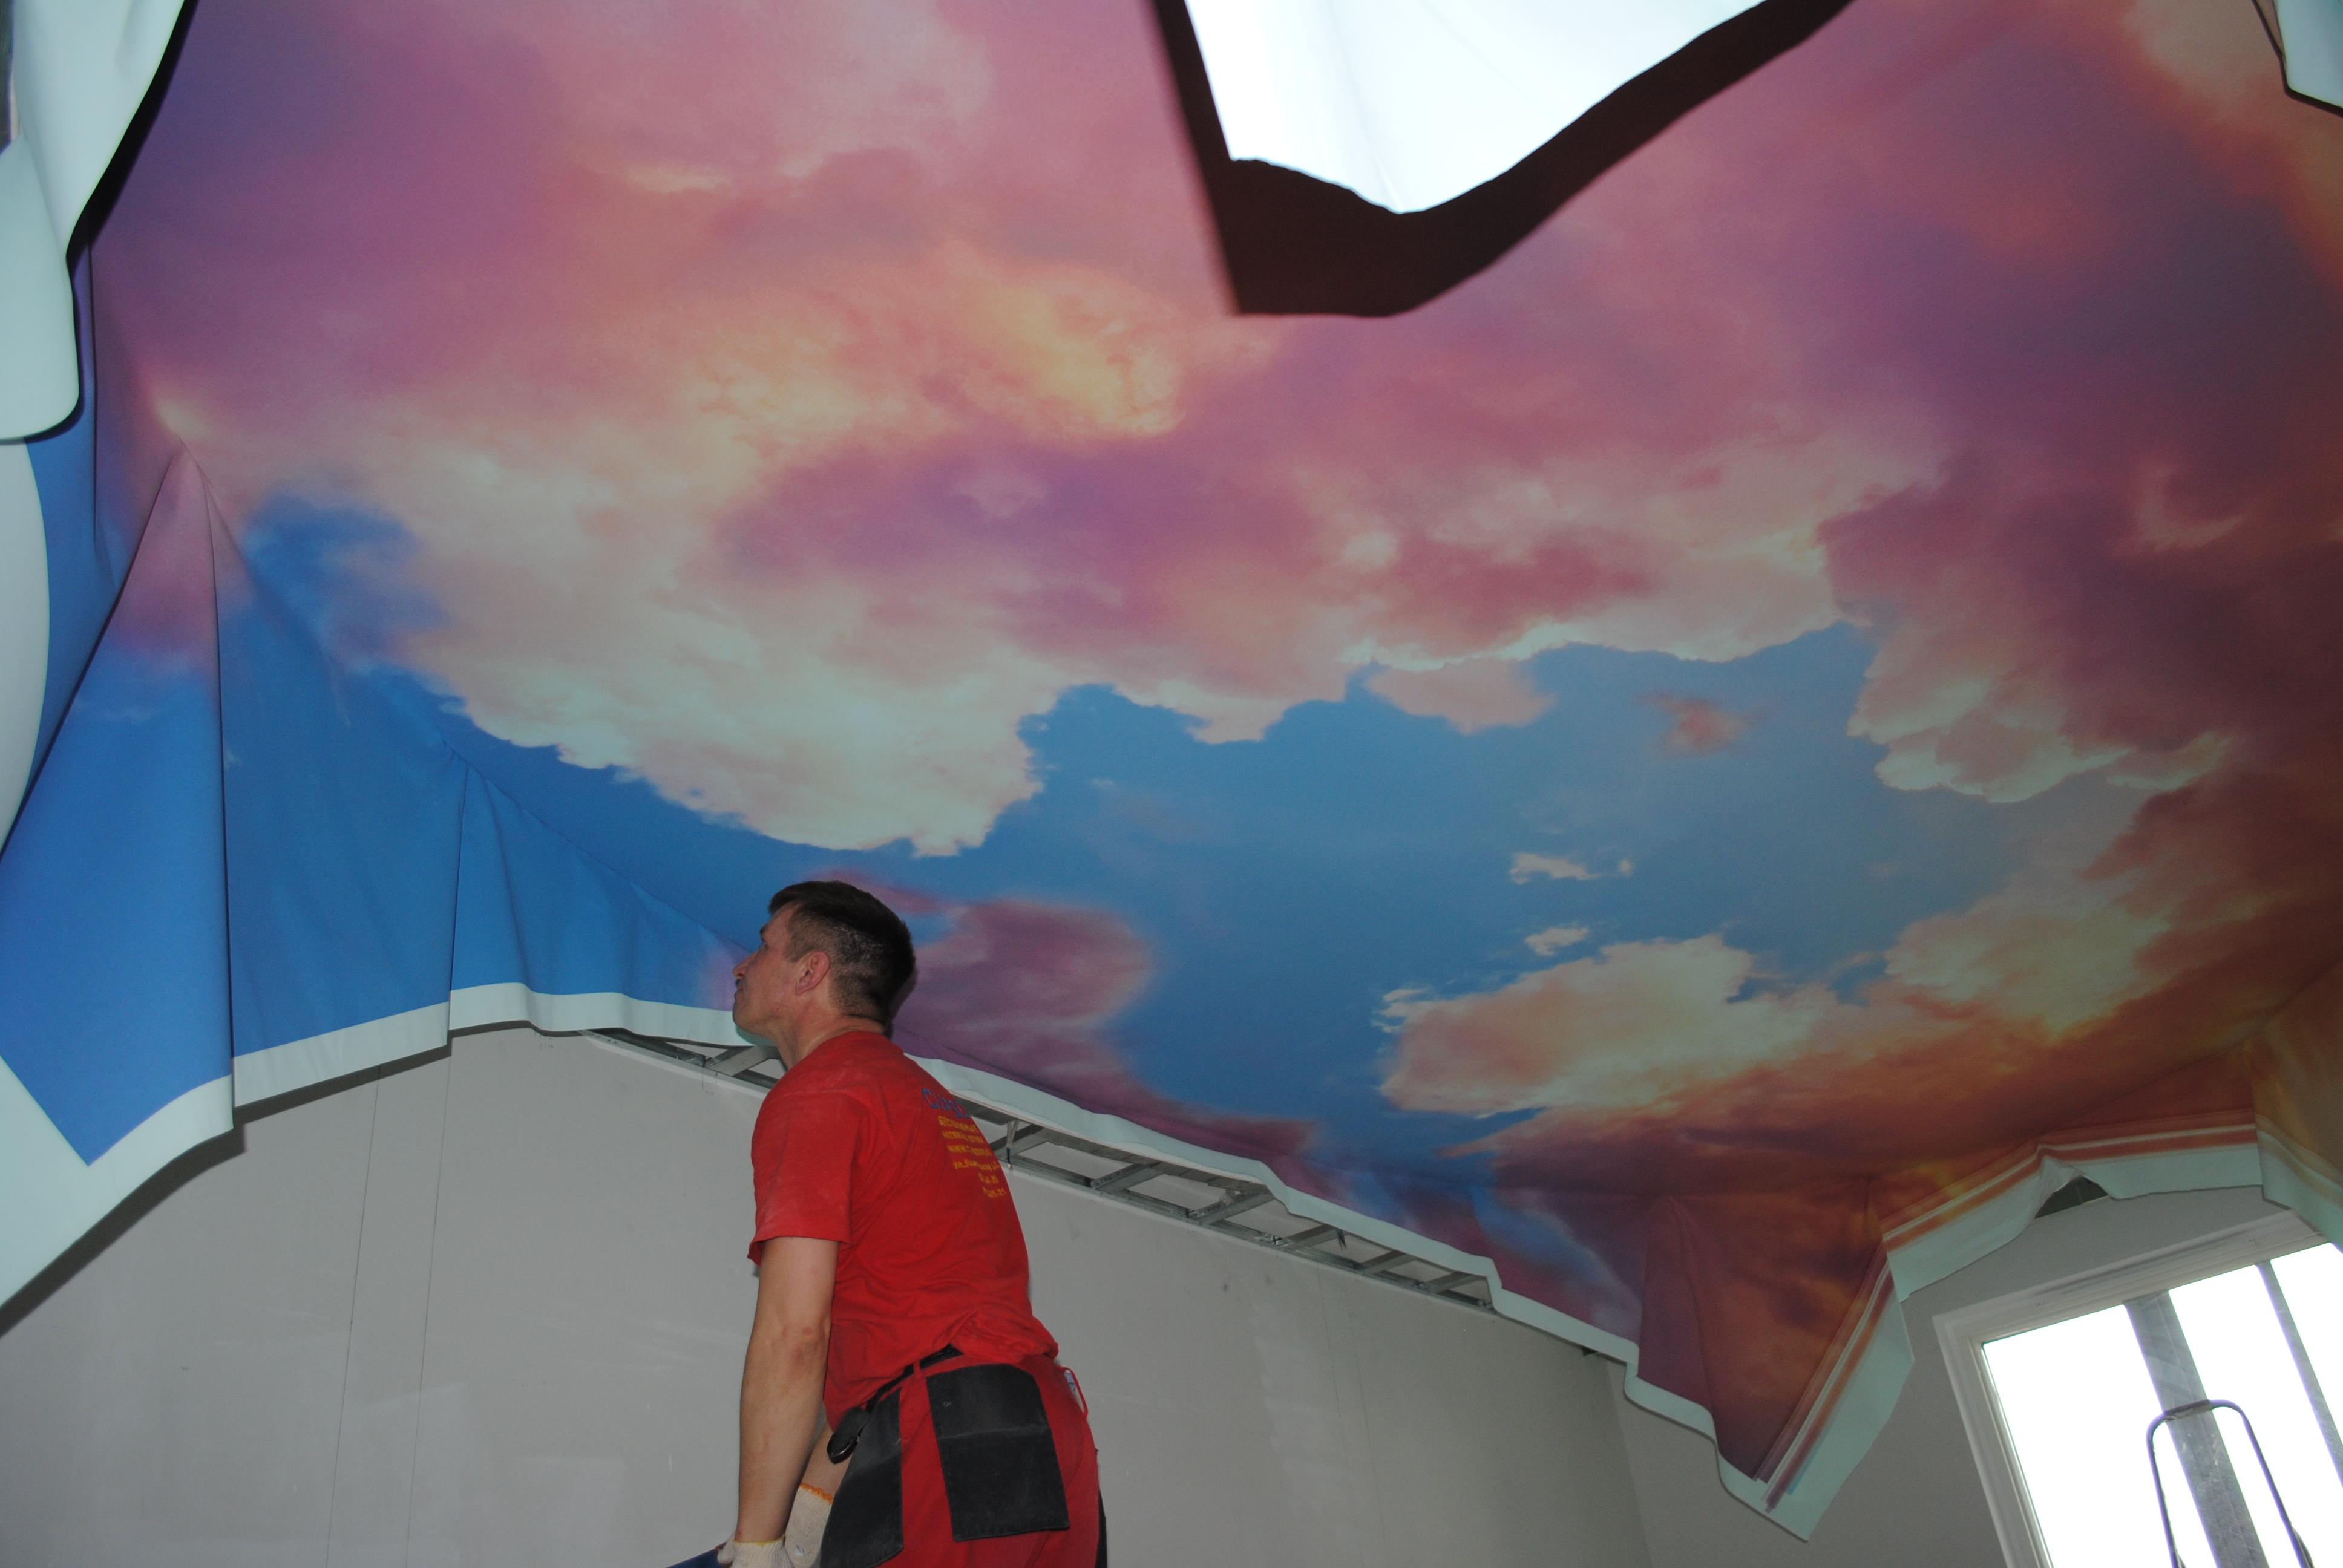 lambris pvc faux plafond rueil malmaison maison martin margiela nettoyer plafond avant peinture. Black Bedroom Furniture Sets. Home Design Ideas